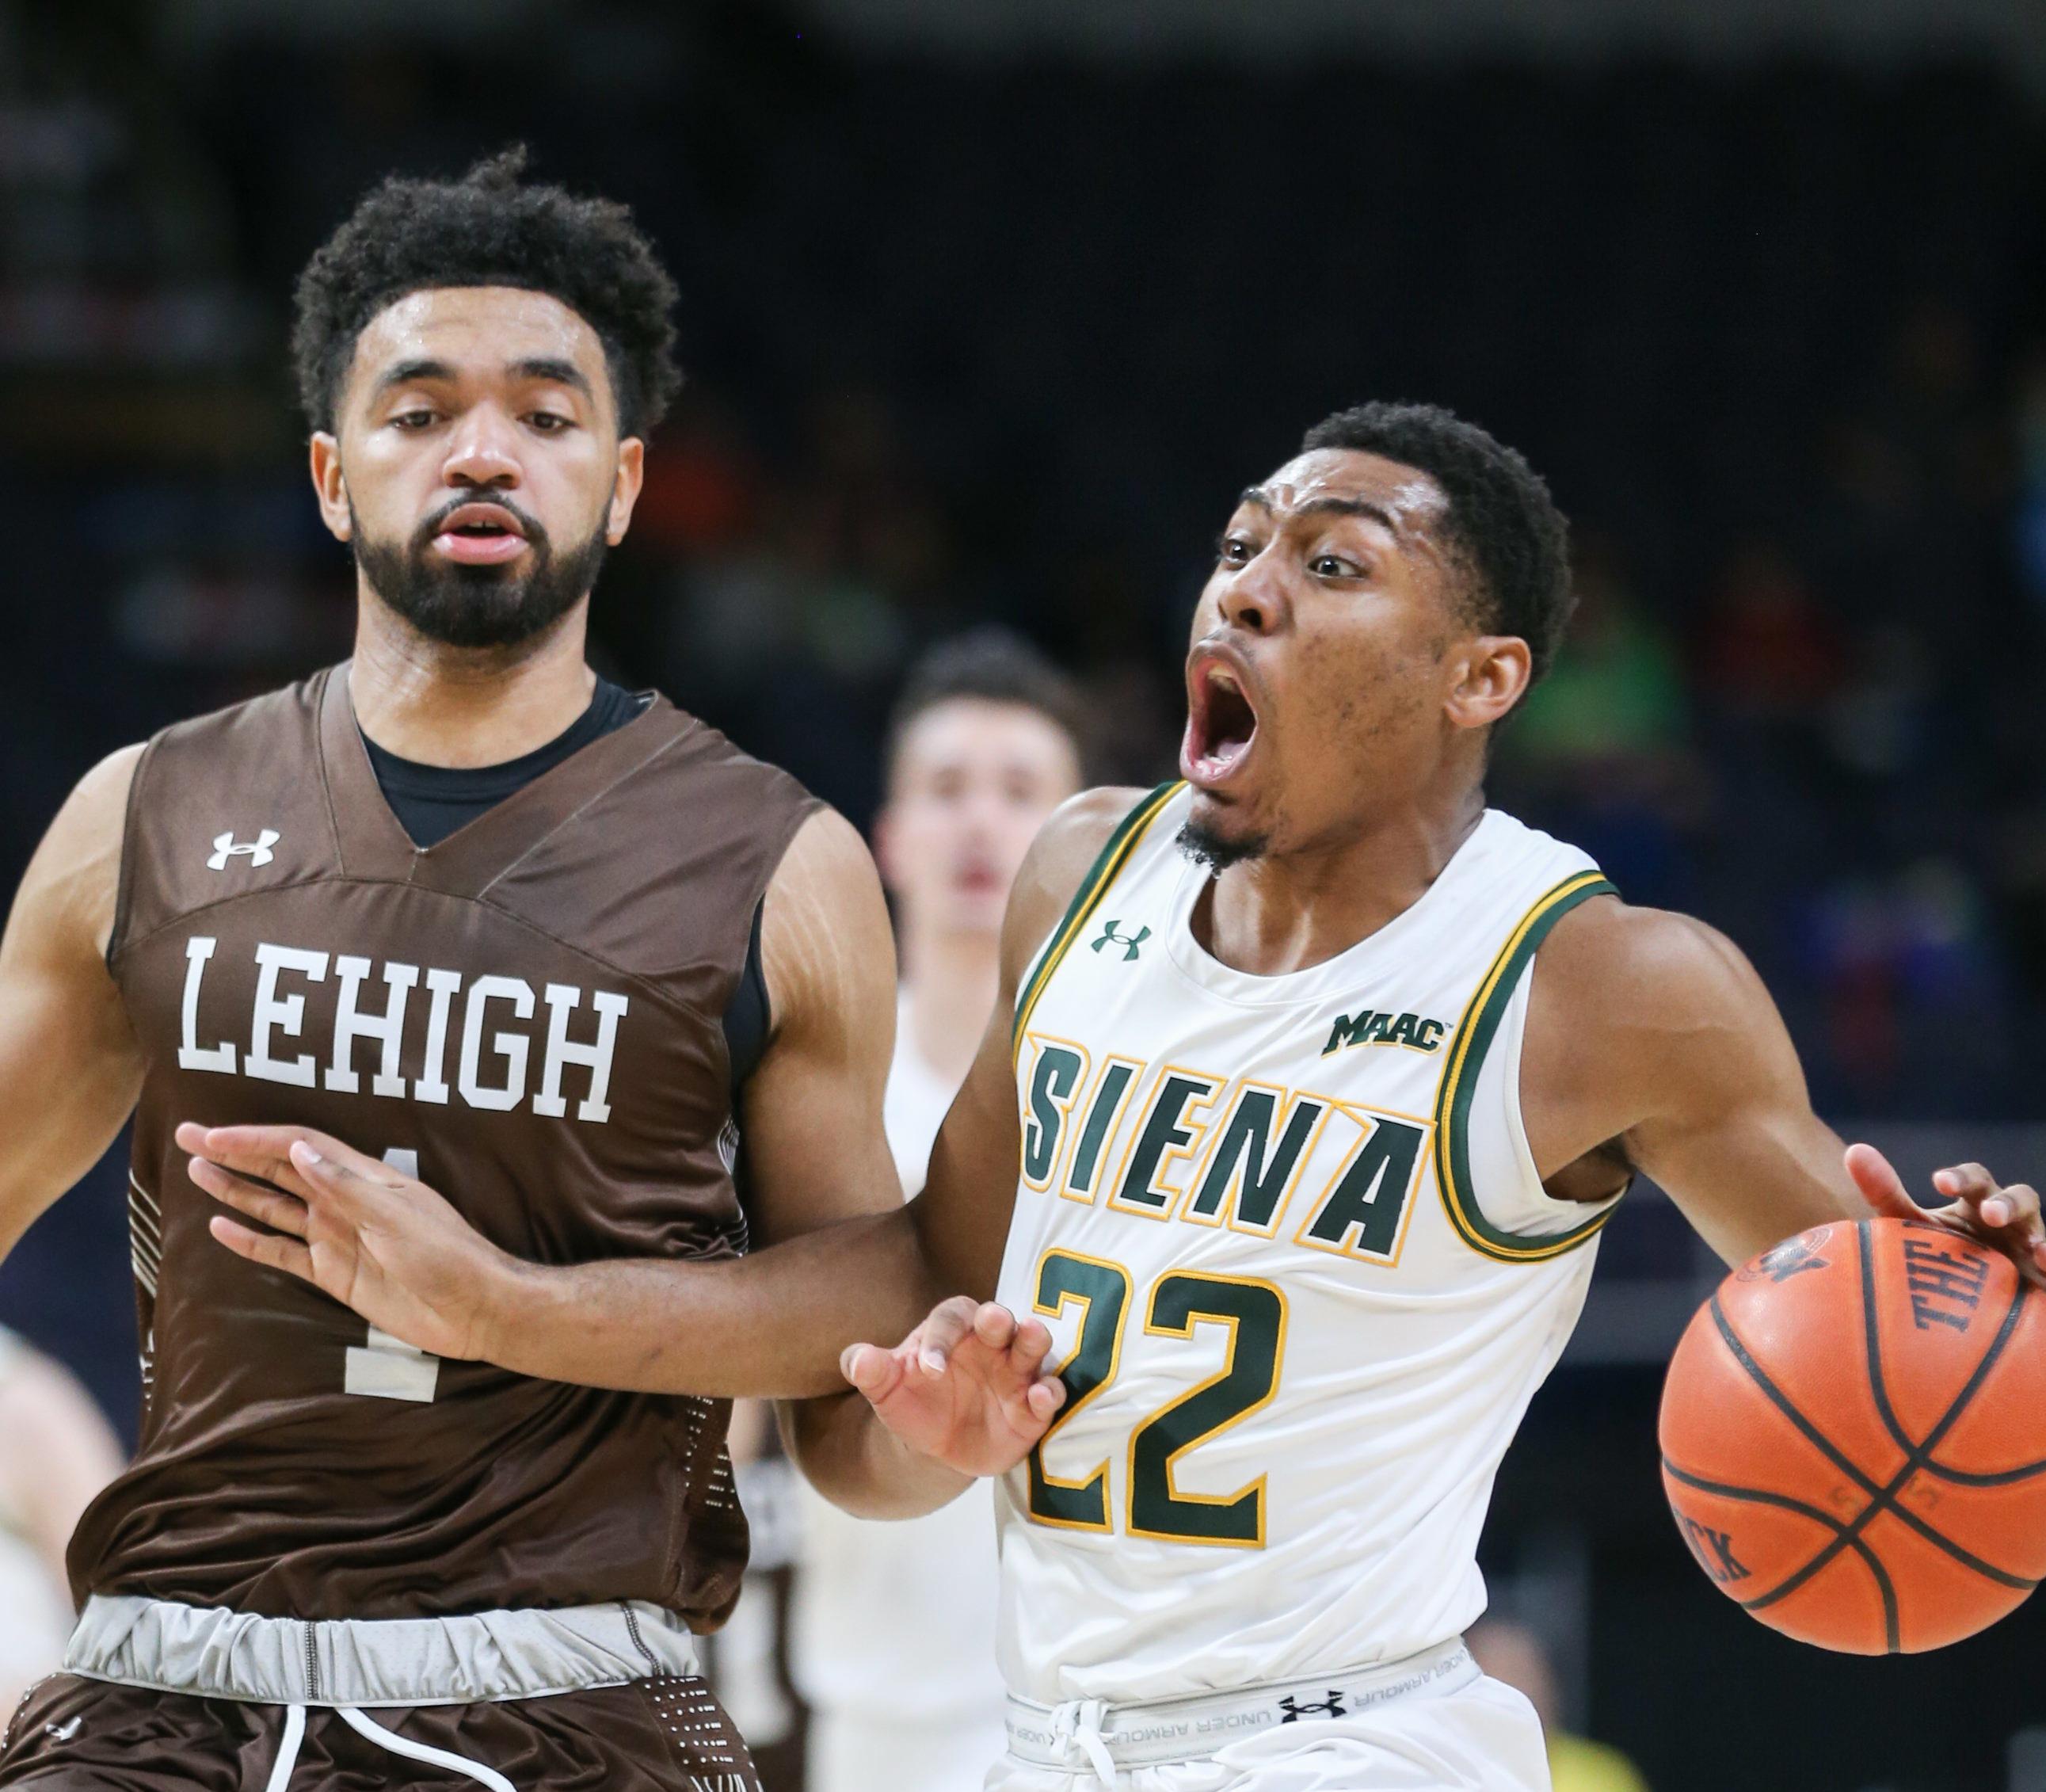 11.21.18 Lehigh – Siena Basketball – 00022